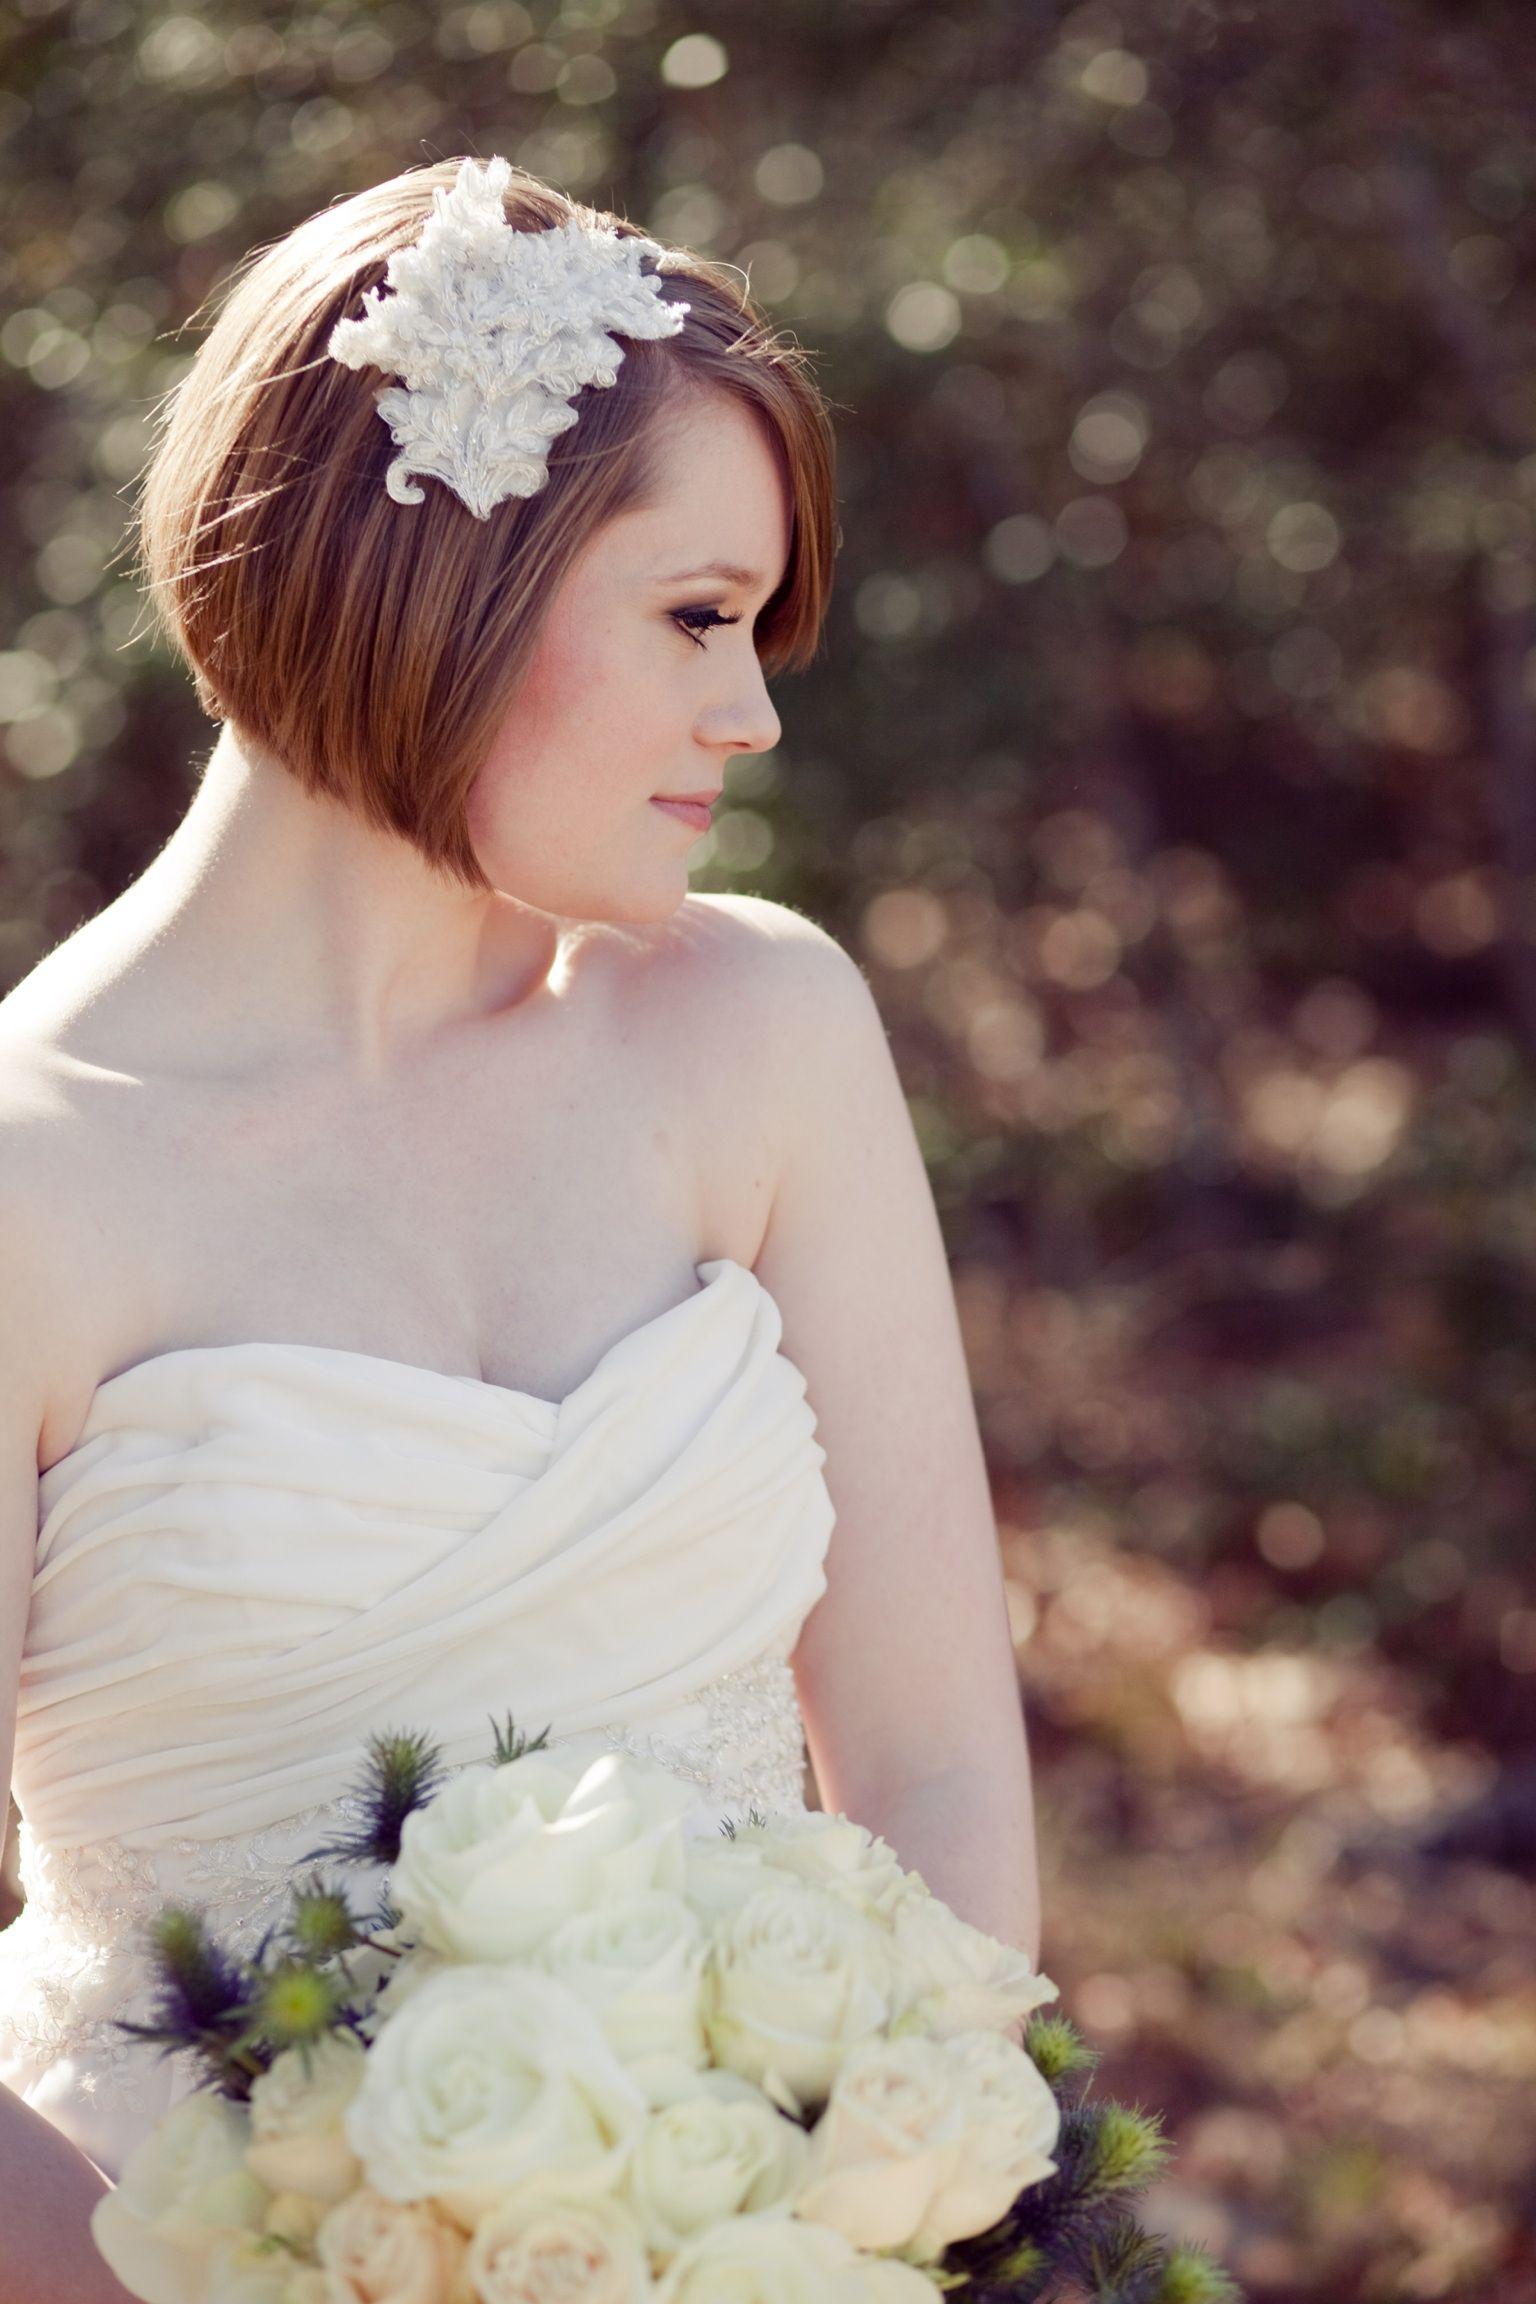 #Short wedding hair... Budget wedding ideas for brides, grooms, parents & planners ... https://itunes.apple.com/us/app/the-gold-wedding-planner/id498112599?ls=1=8 … plus how to organise an entire wedding ♥ The Gold Wedding Planner iPhone App ♥